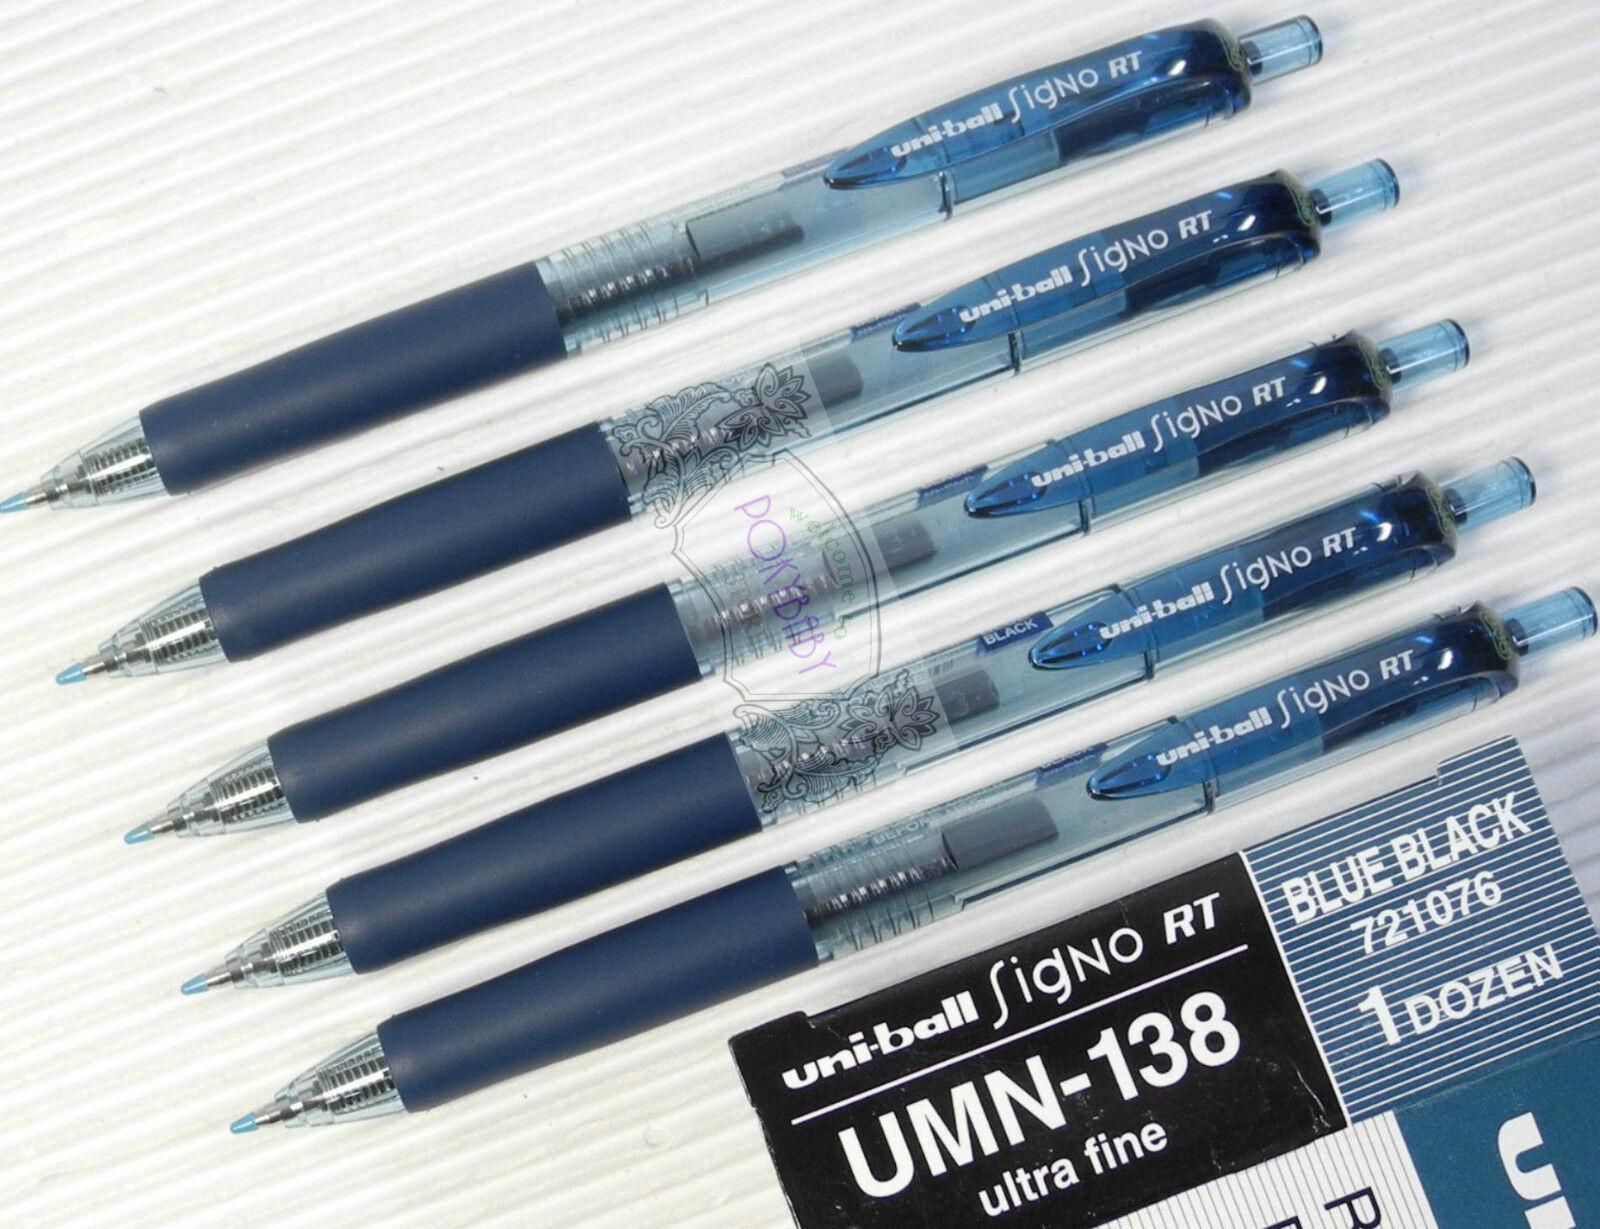 Uni-ball Signo RT0.38mm retractable gel pen UMN-138 Lavender Black x 5 pcs